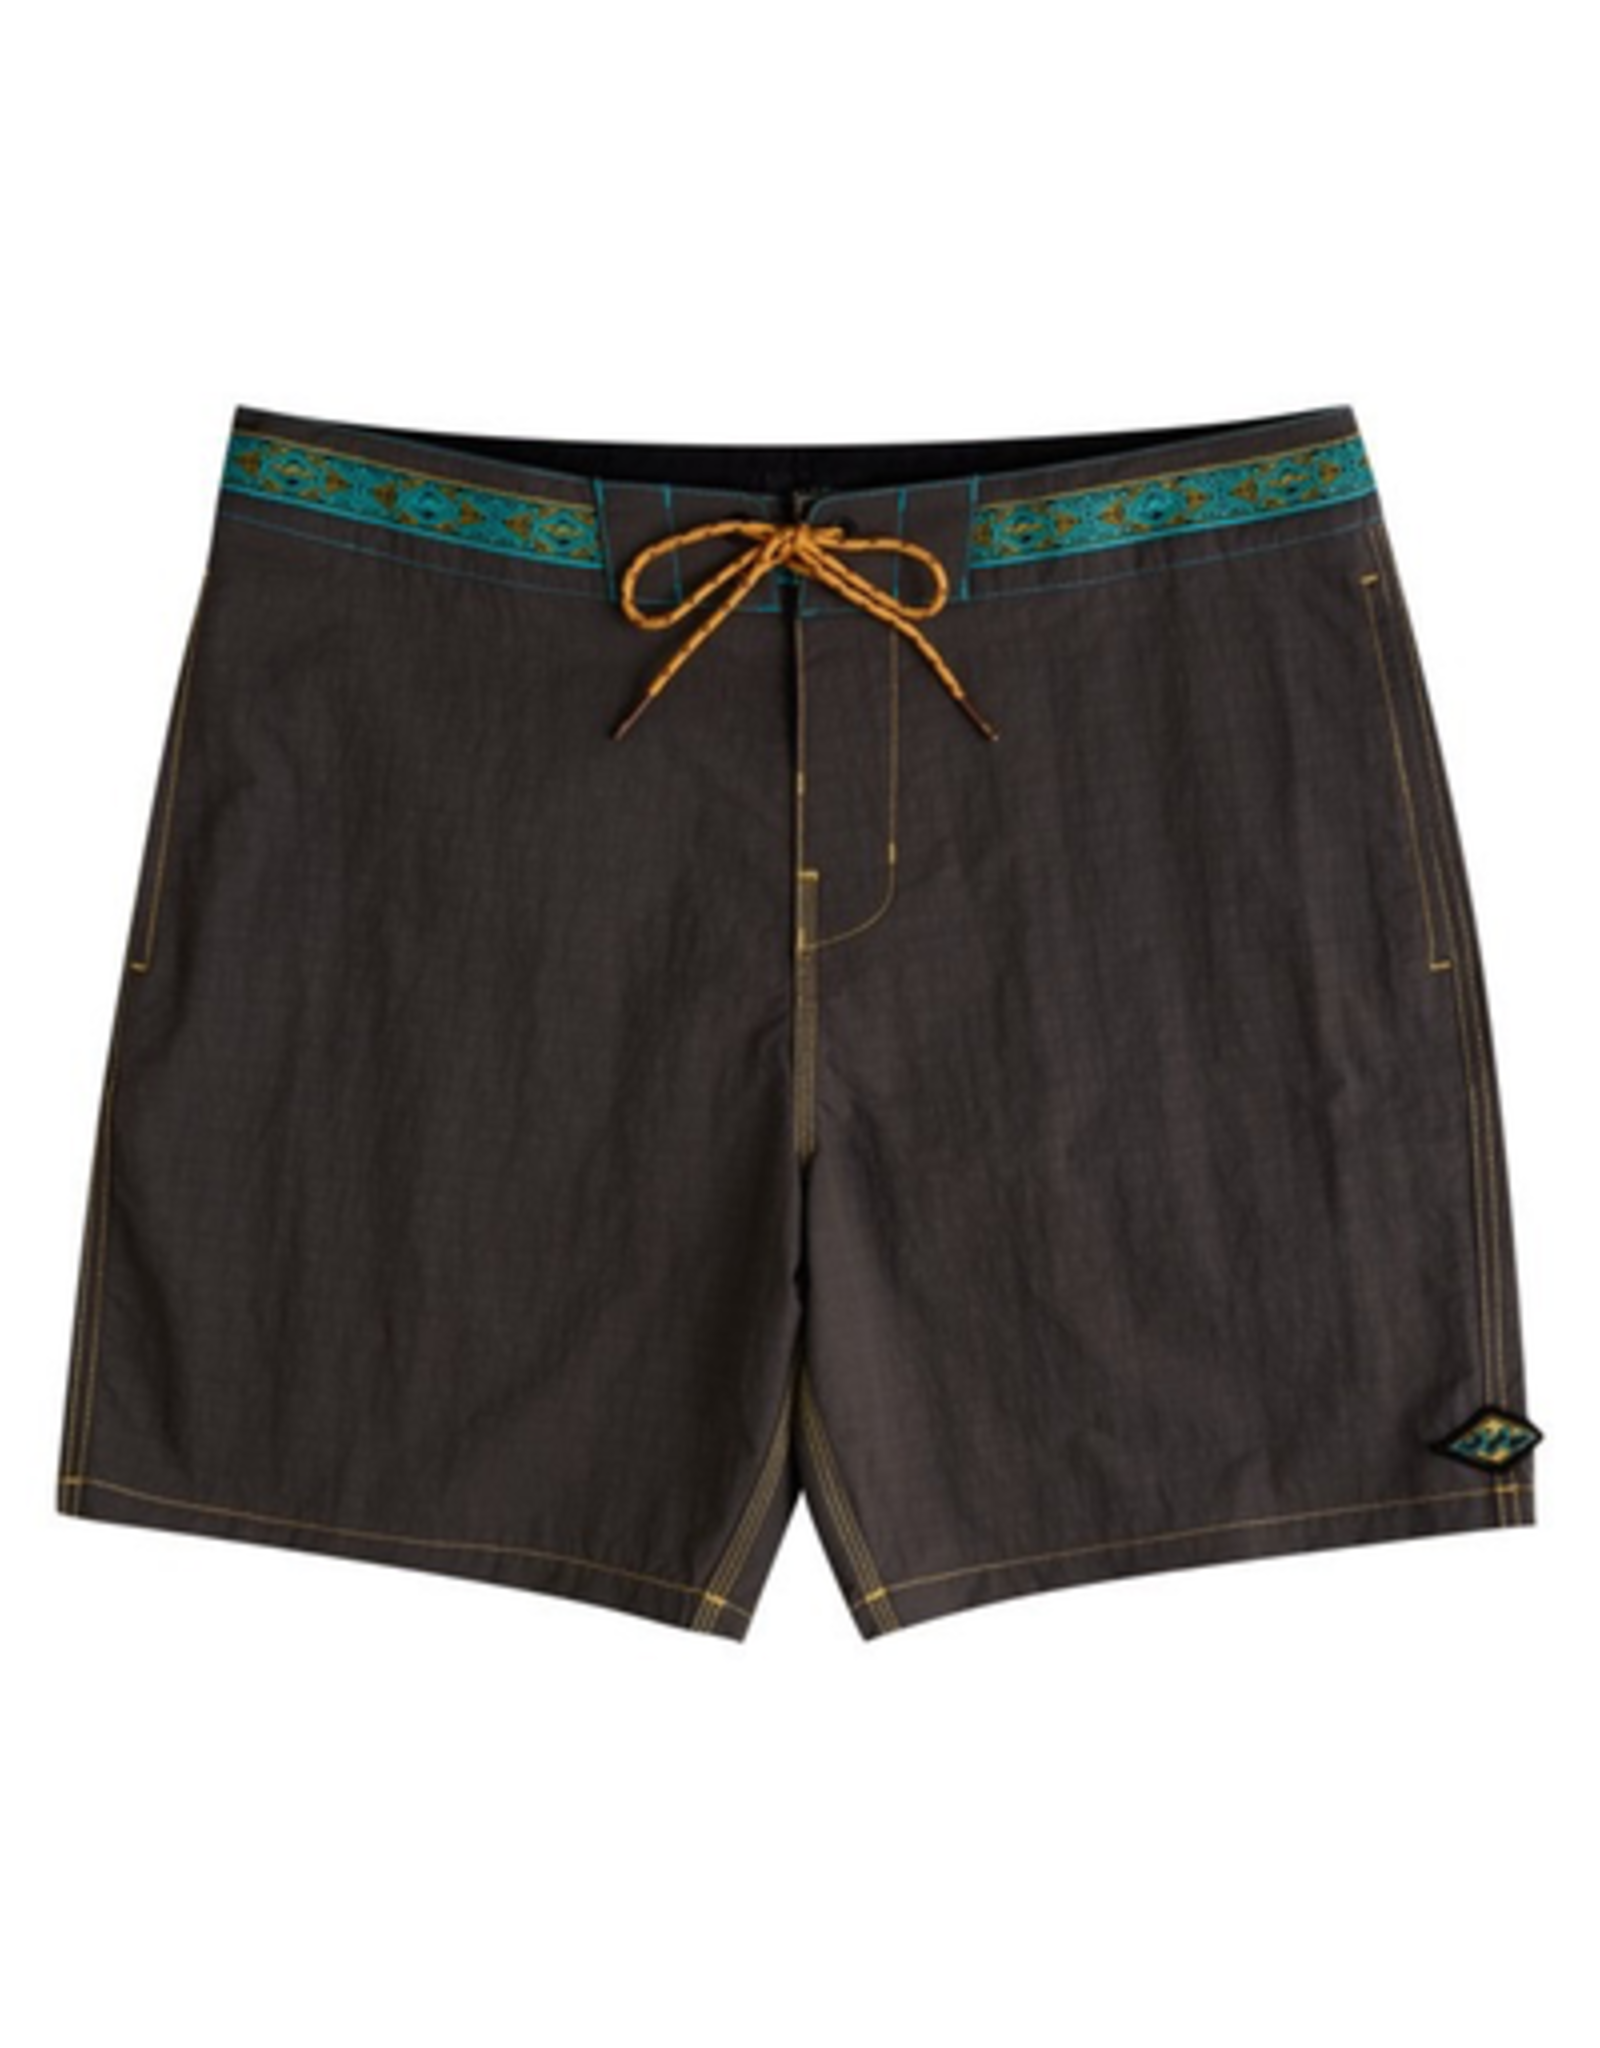 "Currents Low Tide 17"" - Board Shorts for Men"